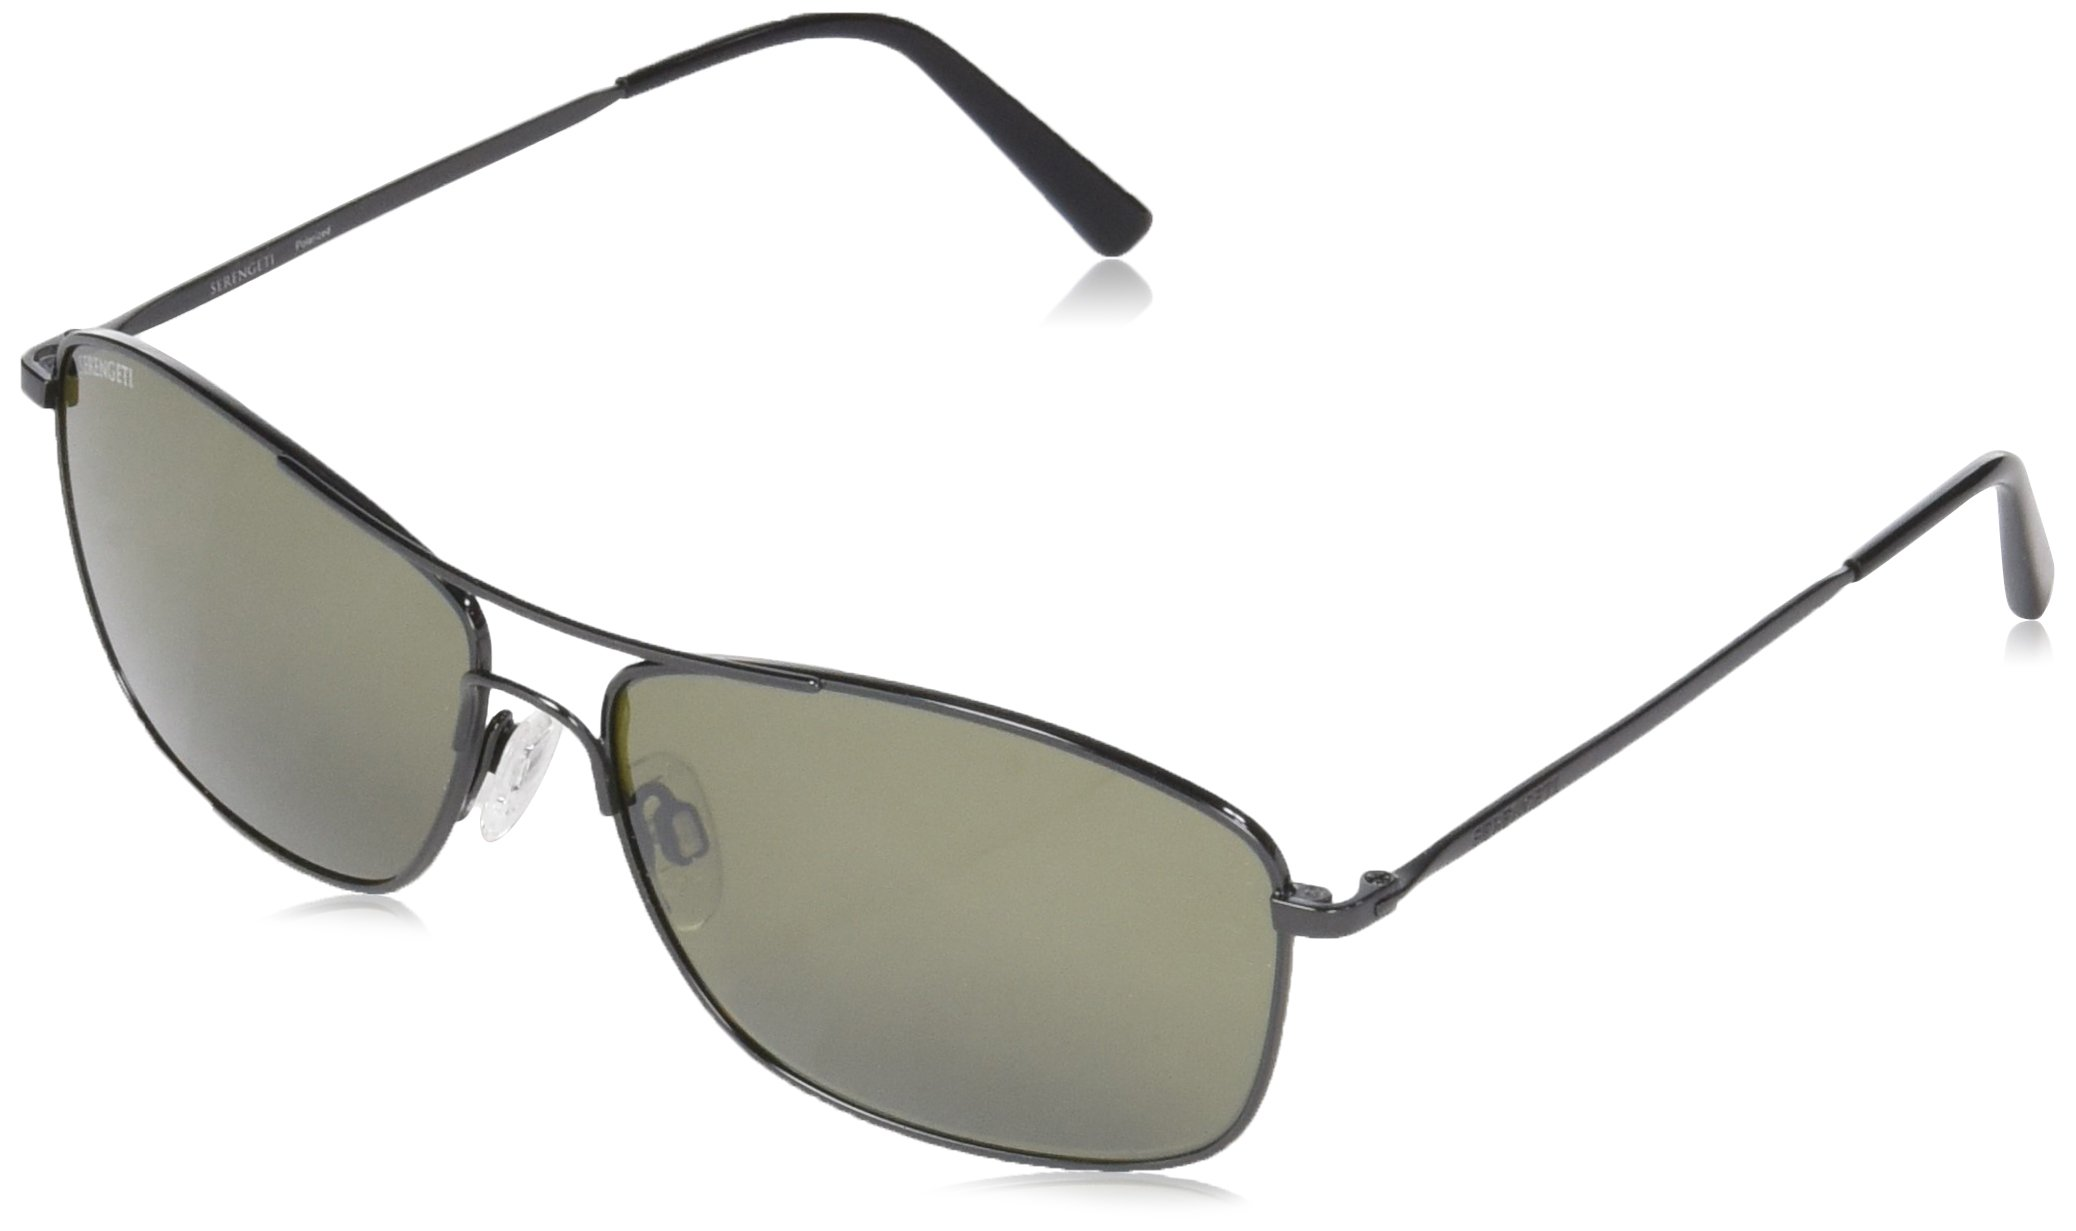 Serengeti Corleone Sunglasses Shiny Gunmetal, Green